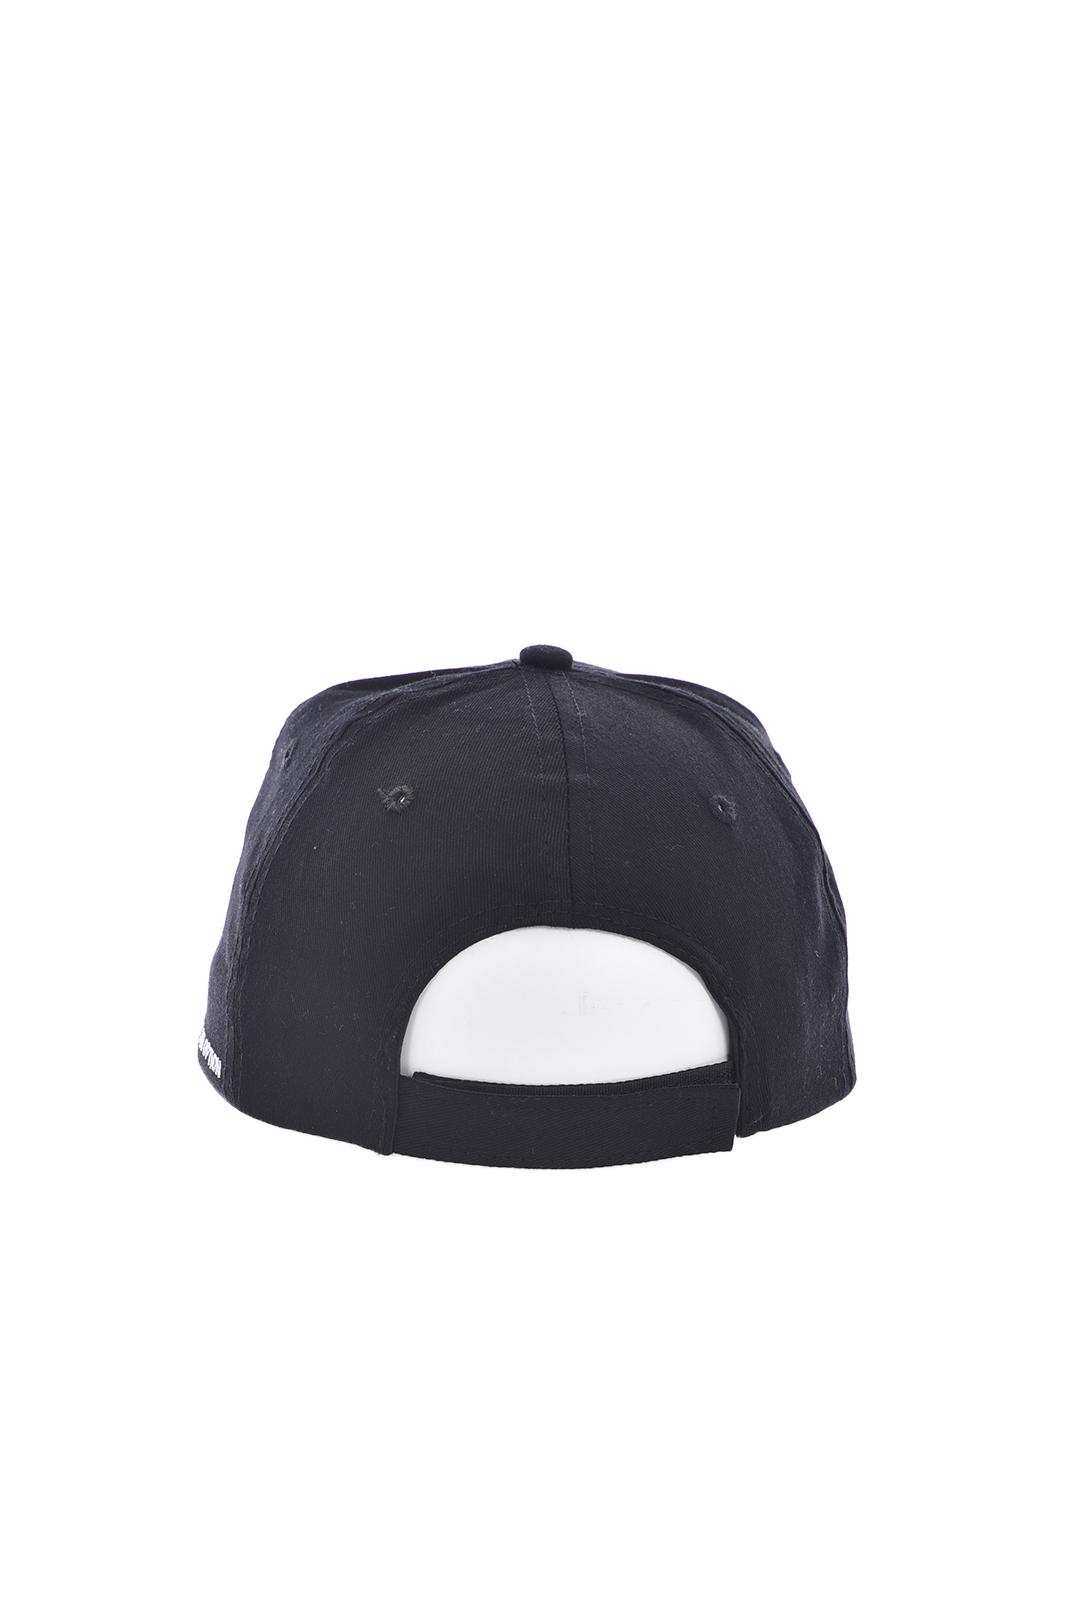 Bonnets / Casquettes  Nasa FLAG-BALL CAP BLACK